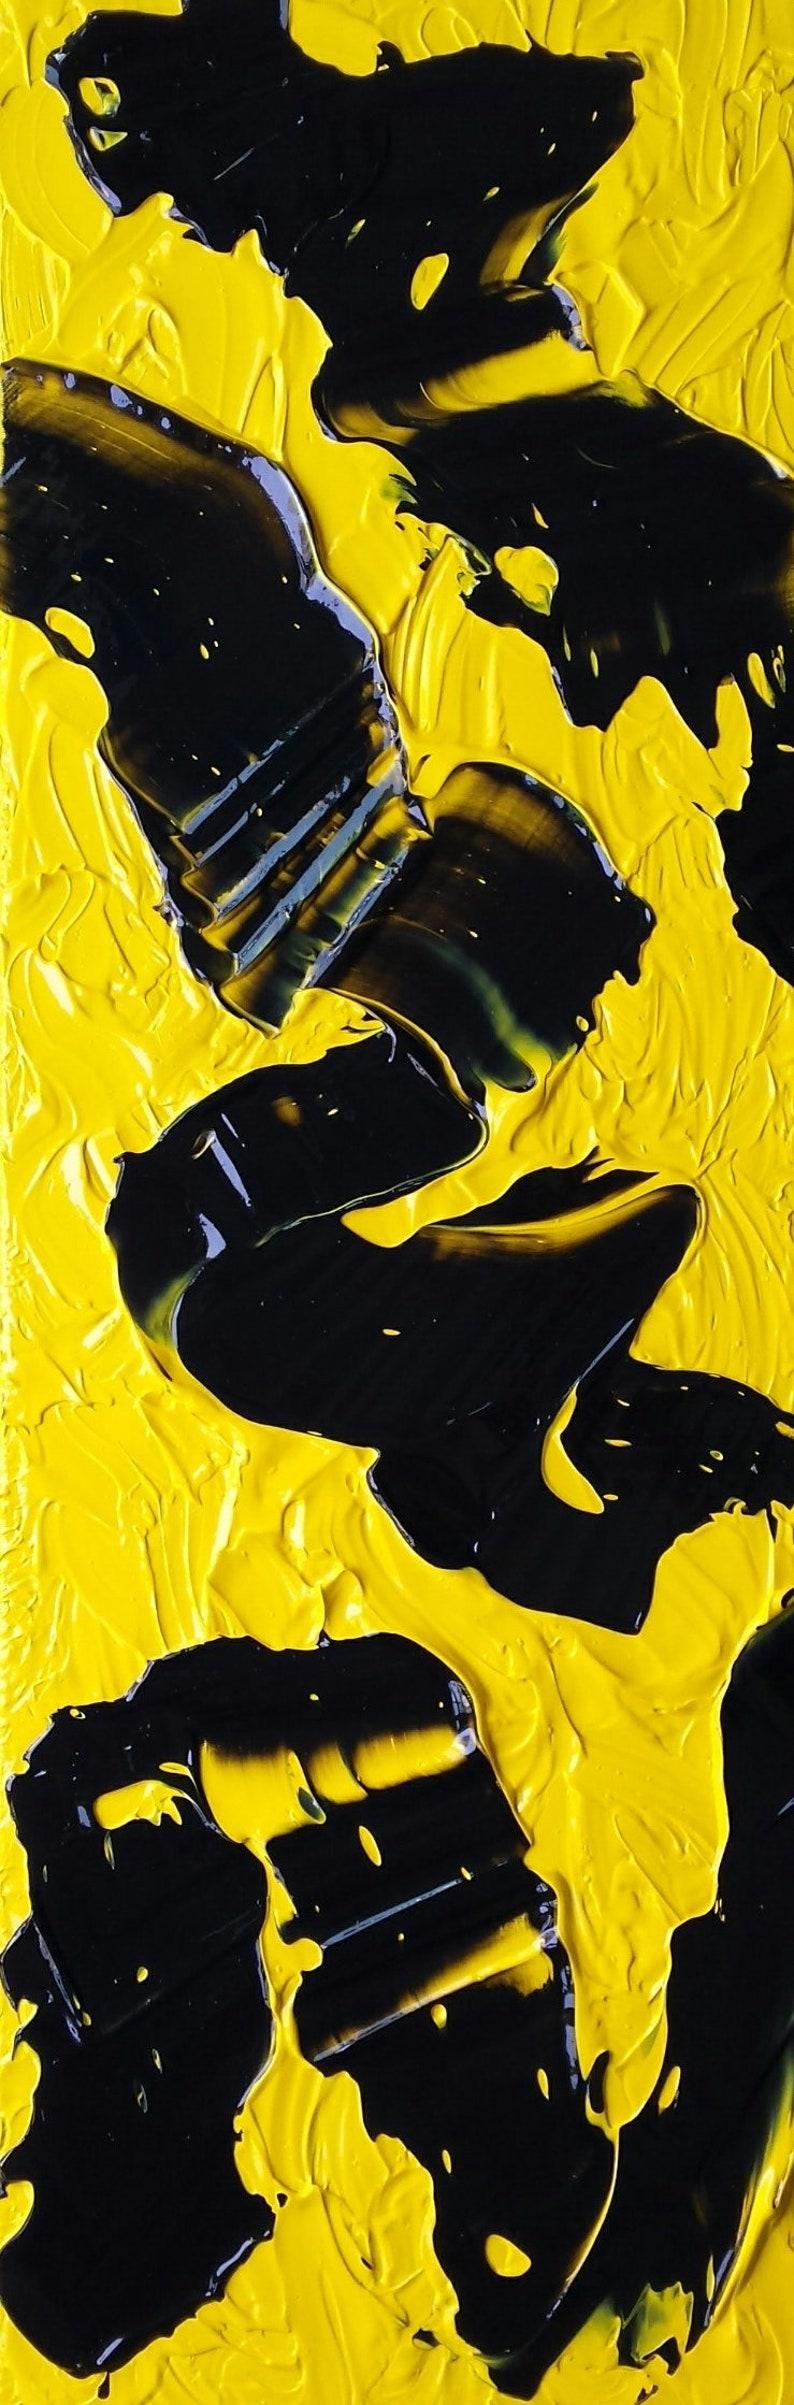 Black Yellow Abstract Film Reel Art Original Art image 0